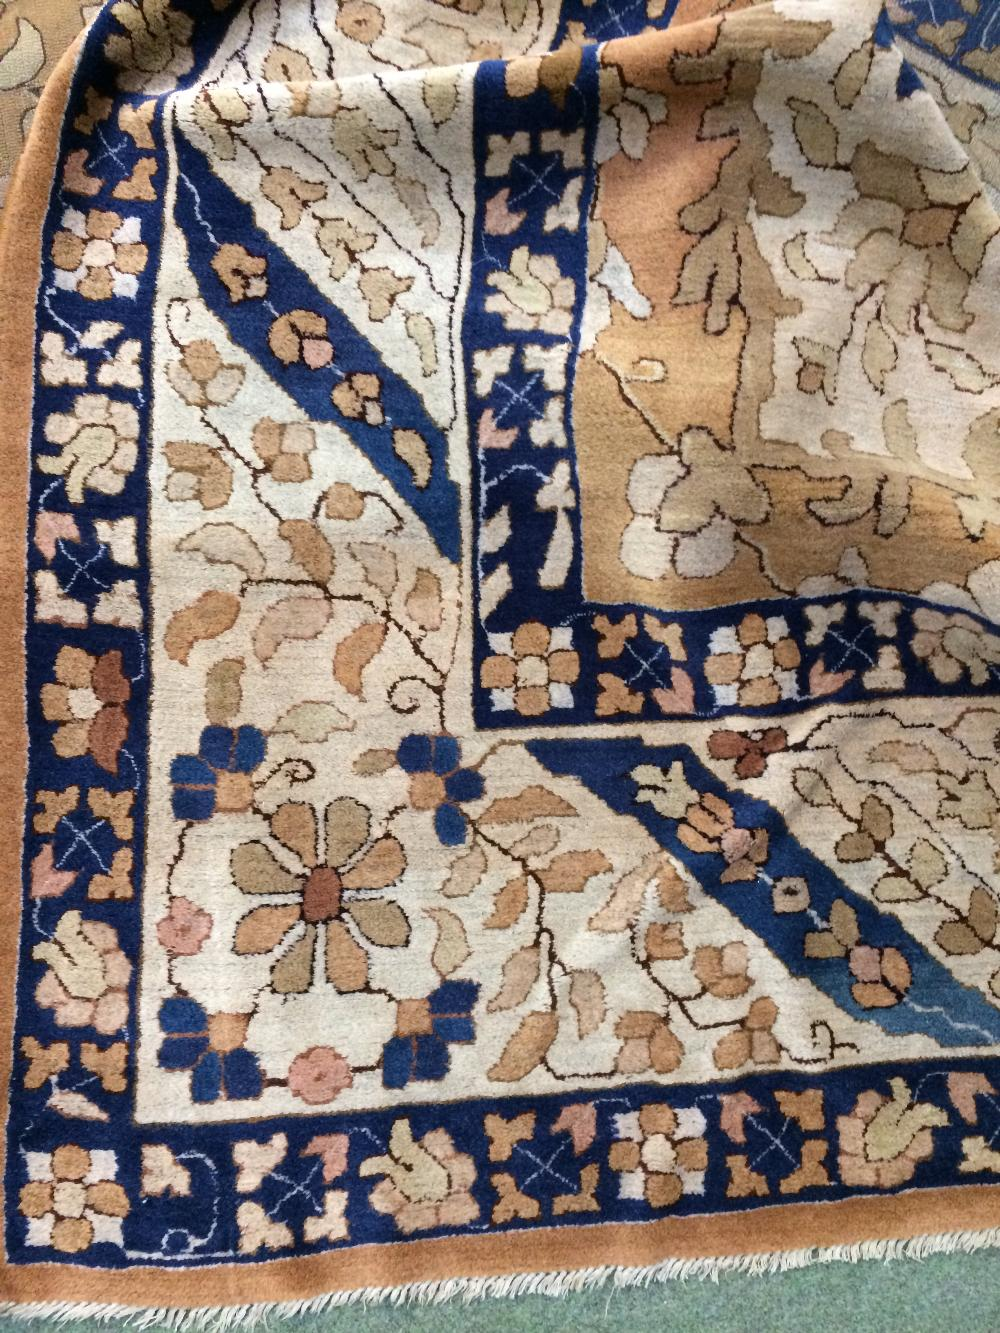 Lot 705 - Large European carpet circa 1920 5.27 X 3.21m